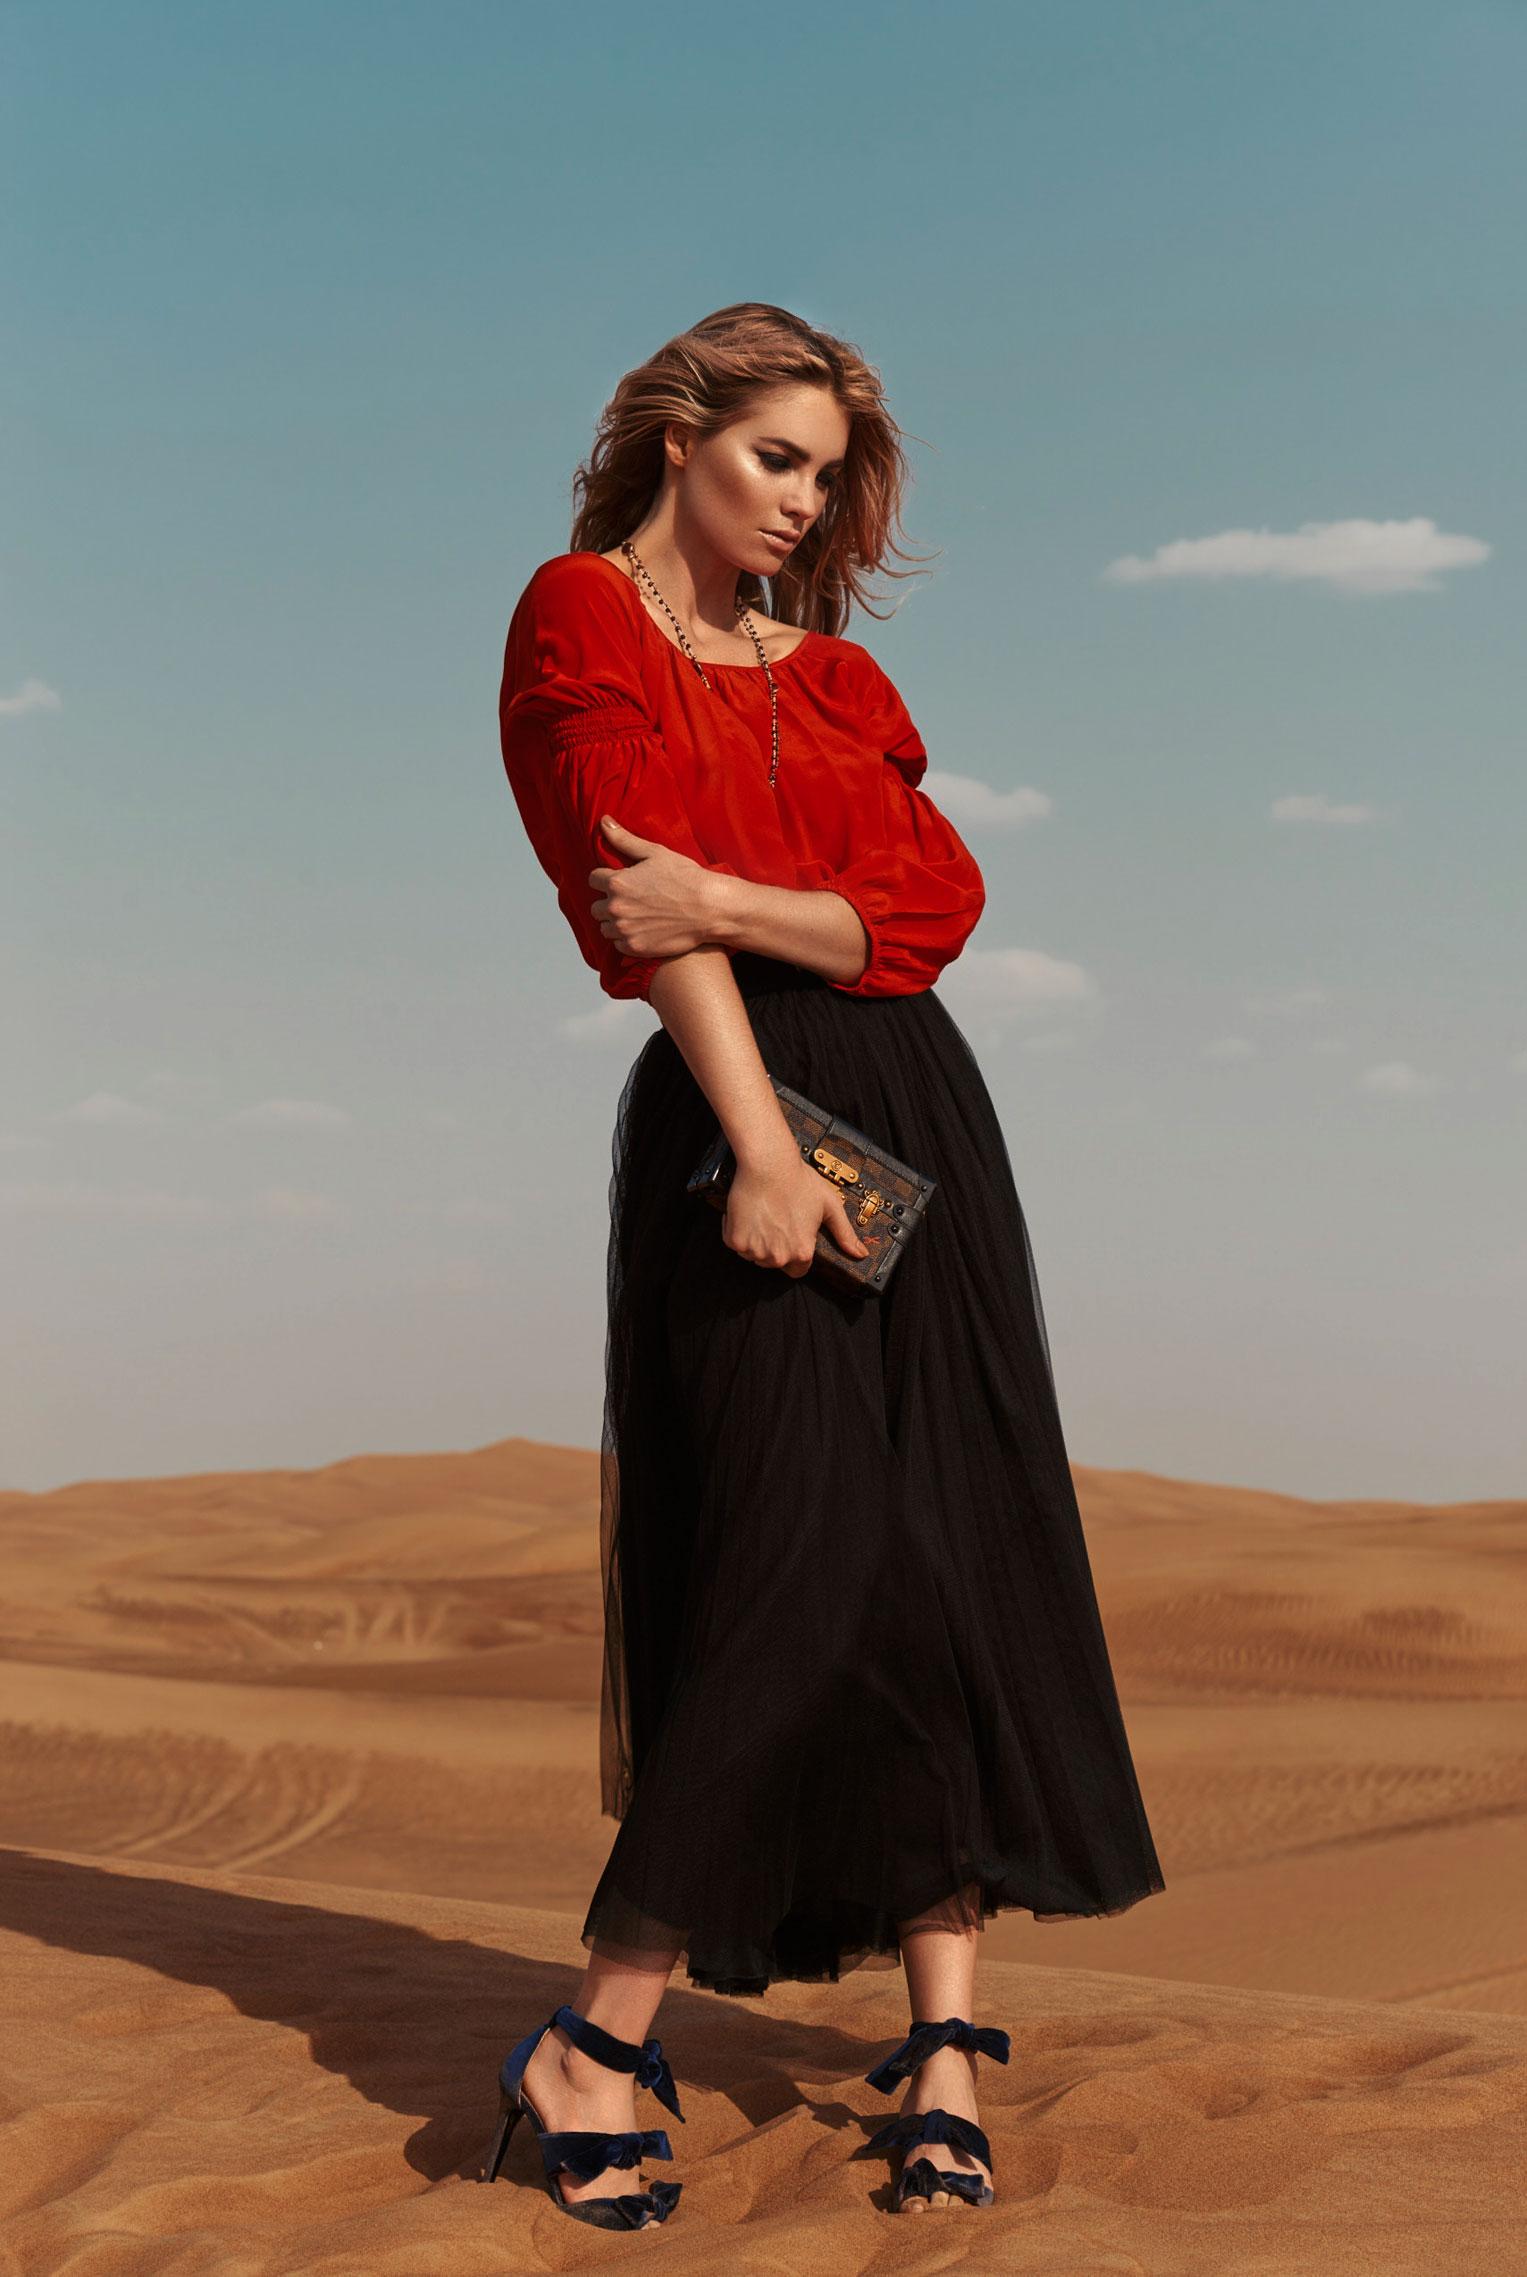 Elyse Taylor by Stefan Imielski / Elle Magazine june 2017